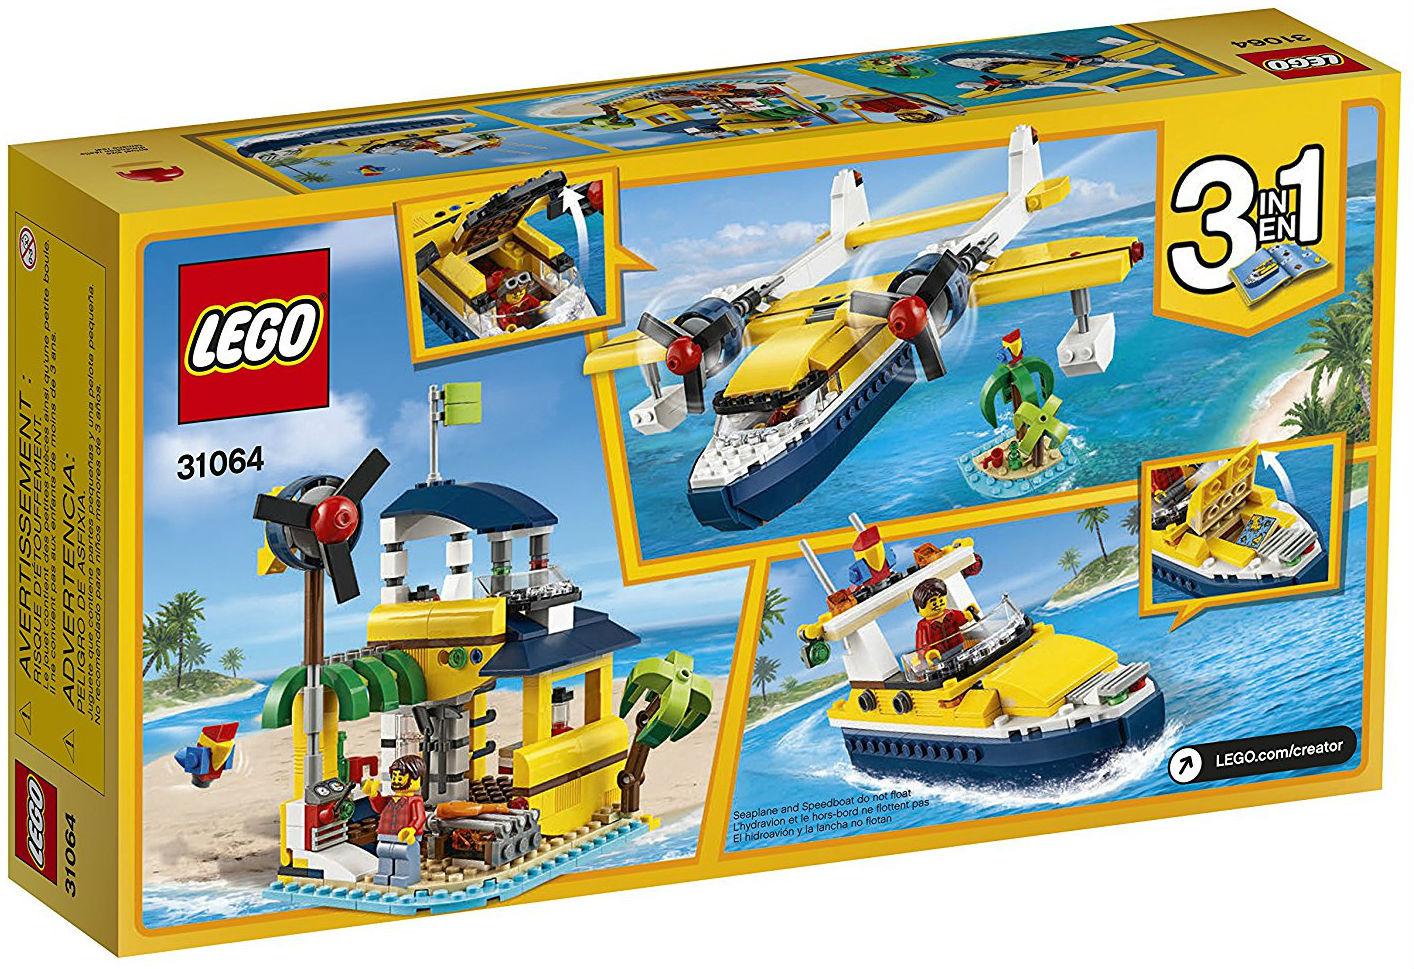 lego creator sets 31064 seaplane adventures new. Black Bedroom Furniture Sets. Home Design Ideas